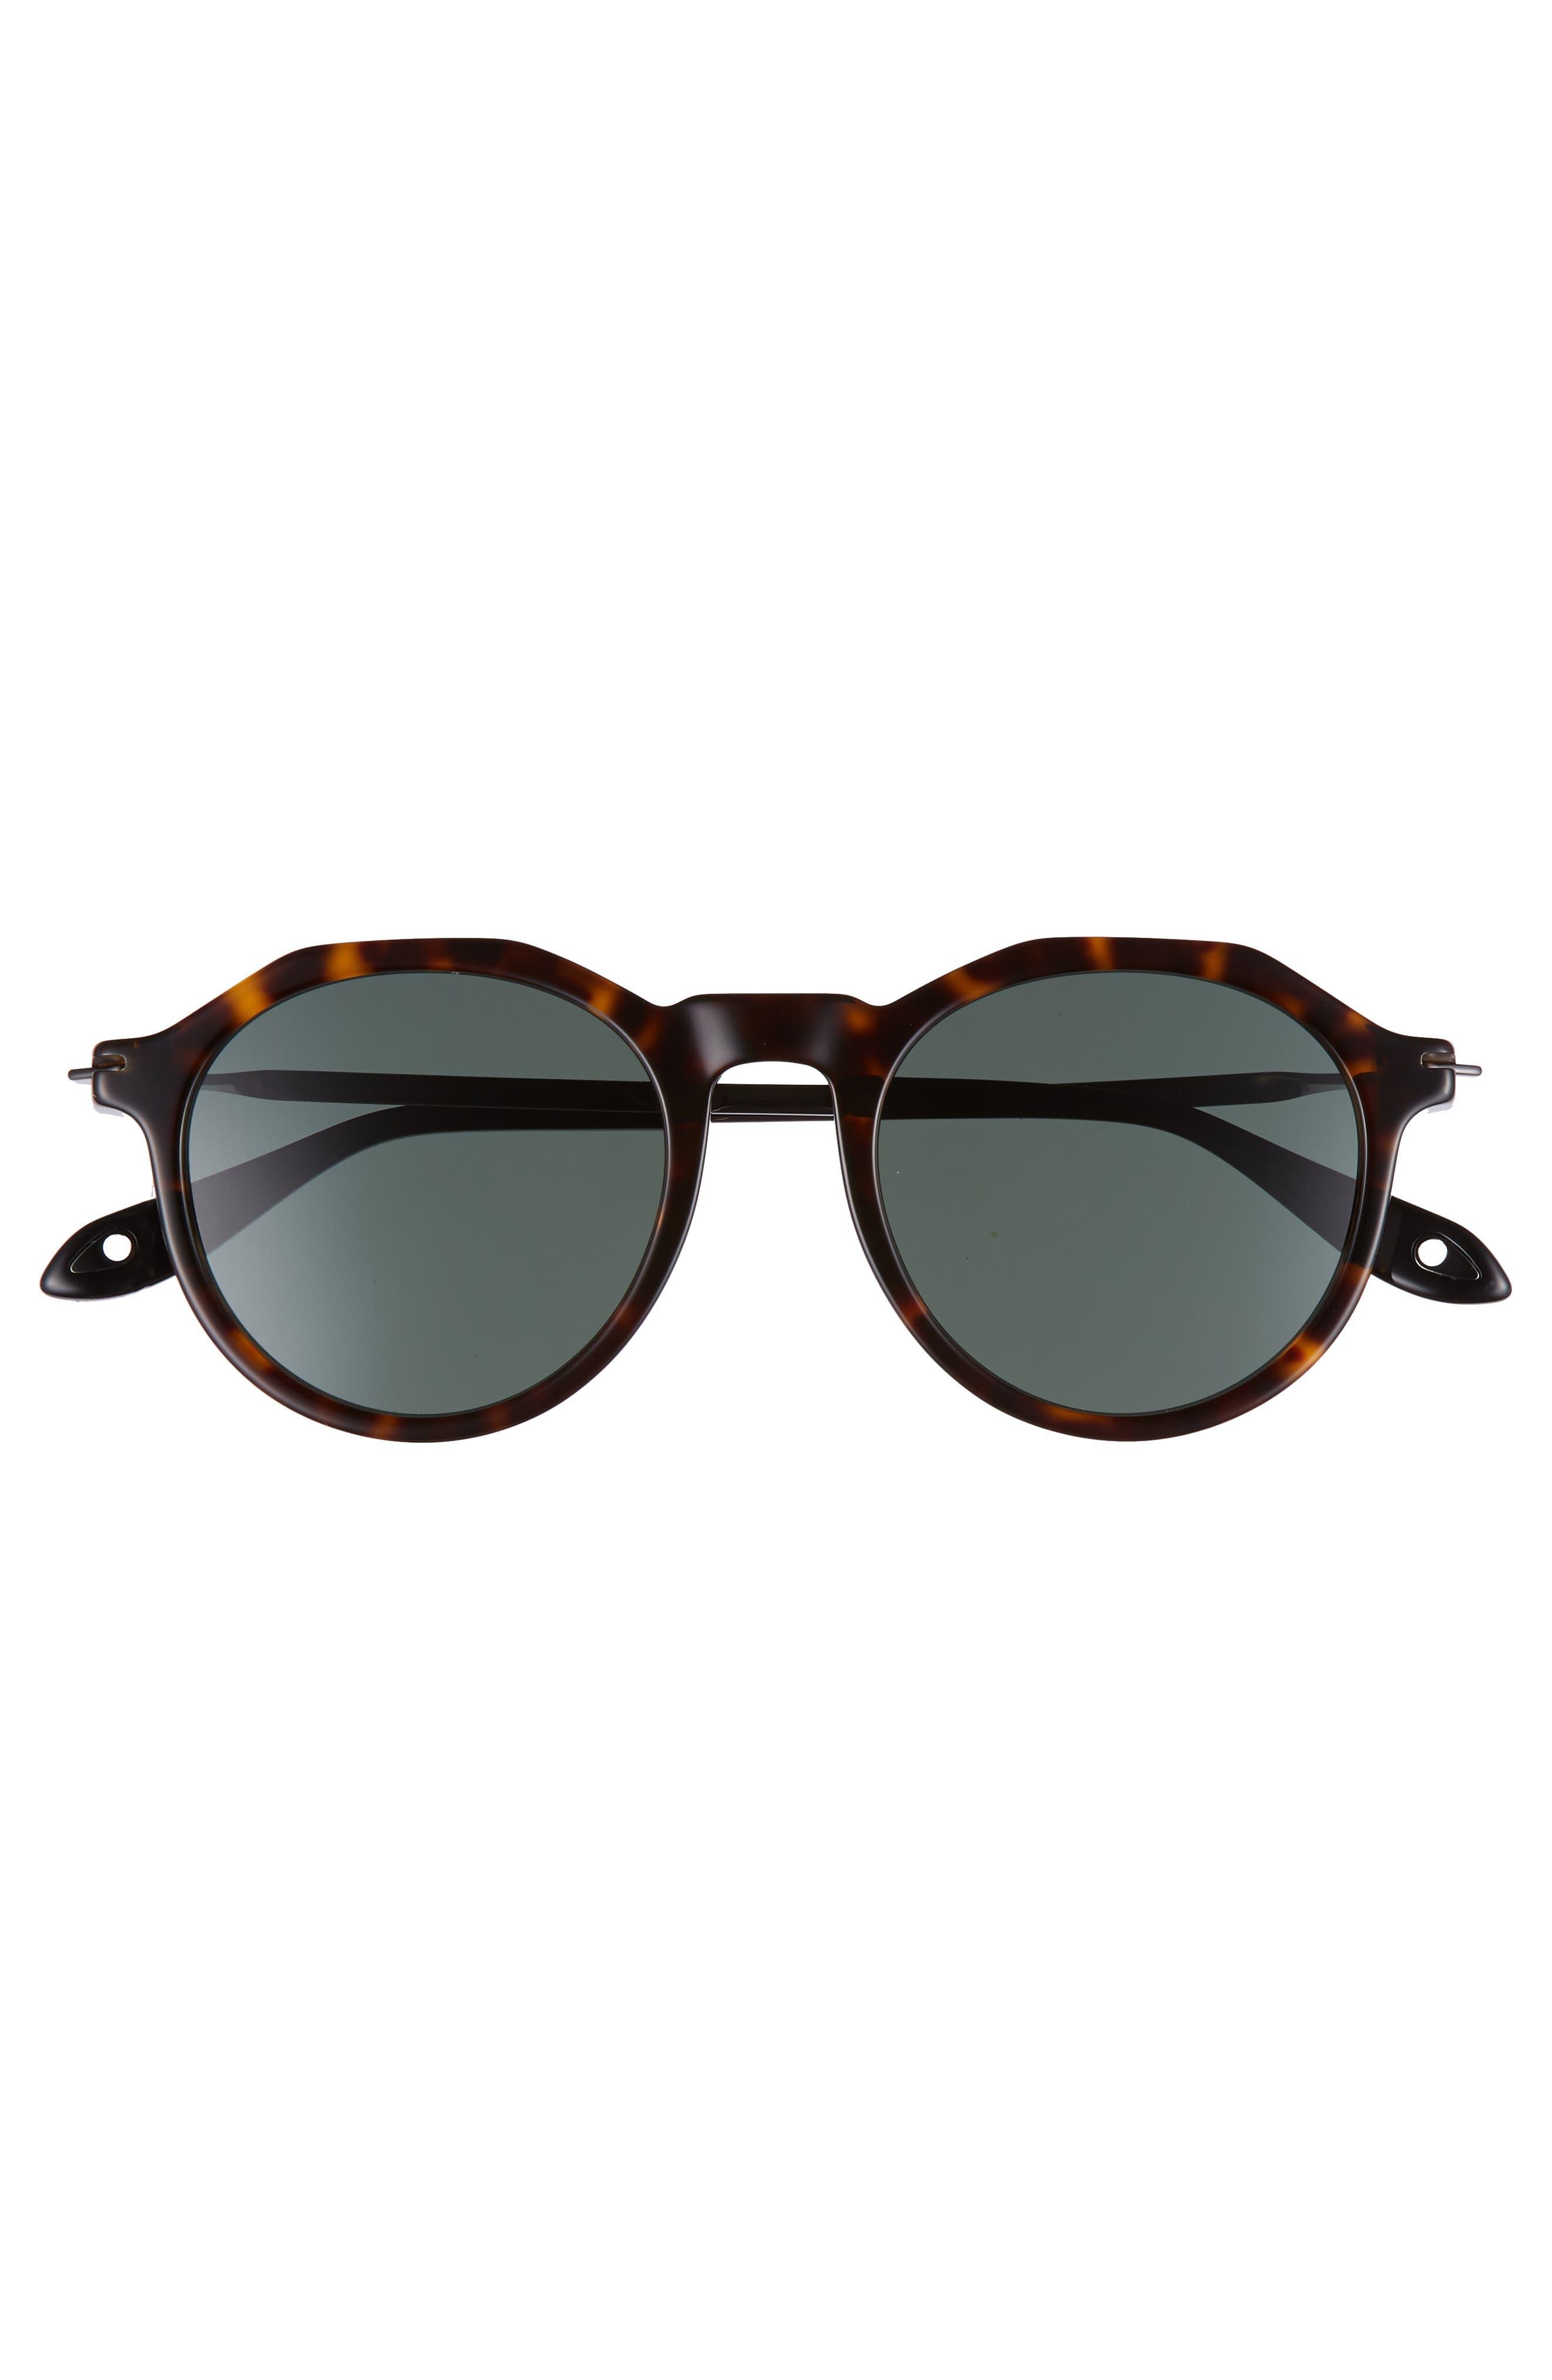 51mm Round Sunglasses,                             Alternate thumbnail 8, color,